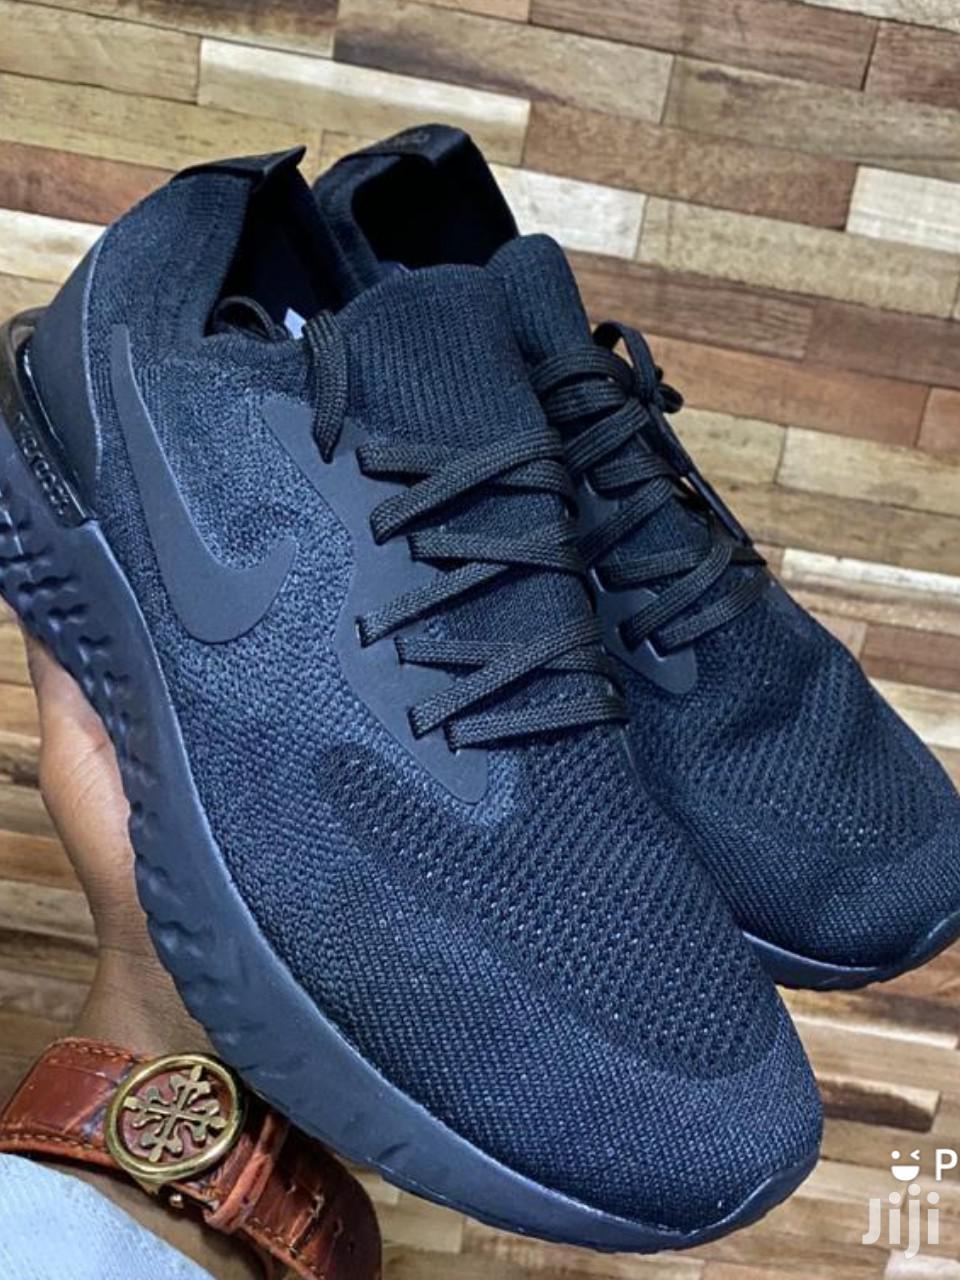 Nike React | Shoes for sale in Nairobi Central, Nairobi, Kenya